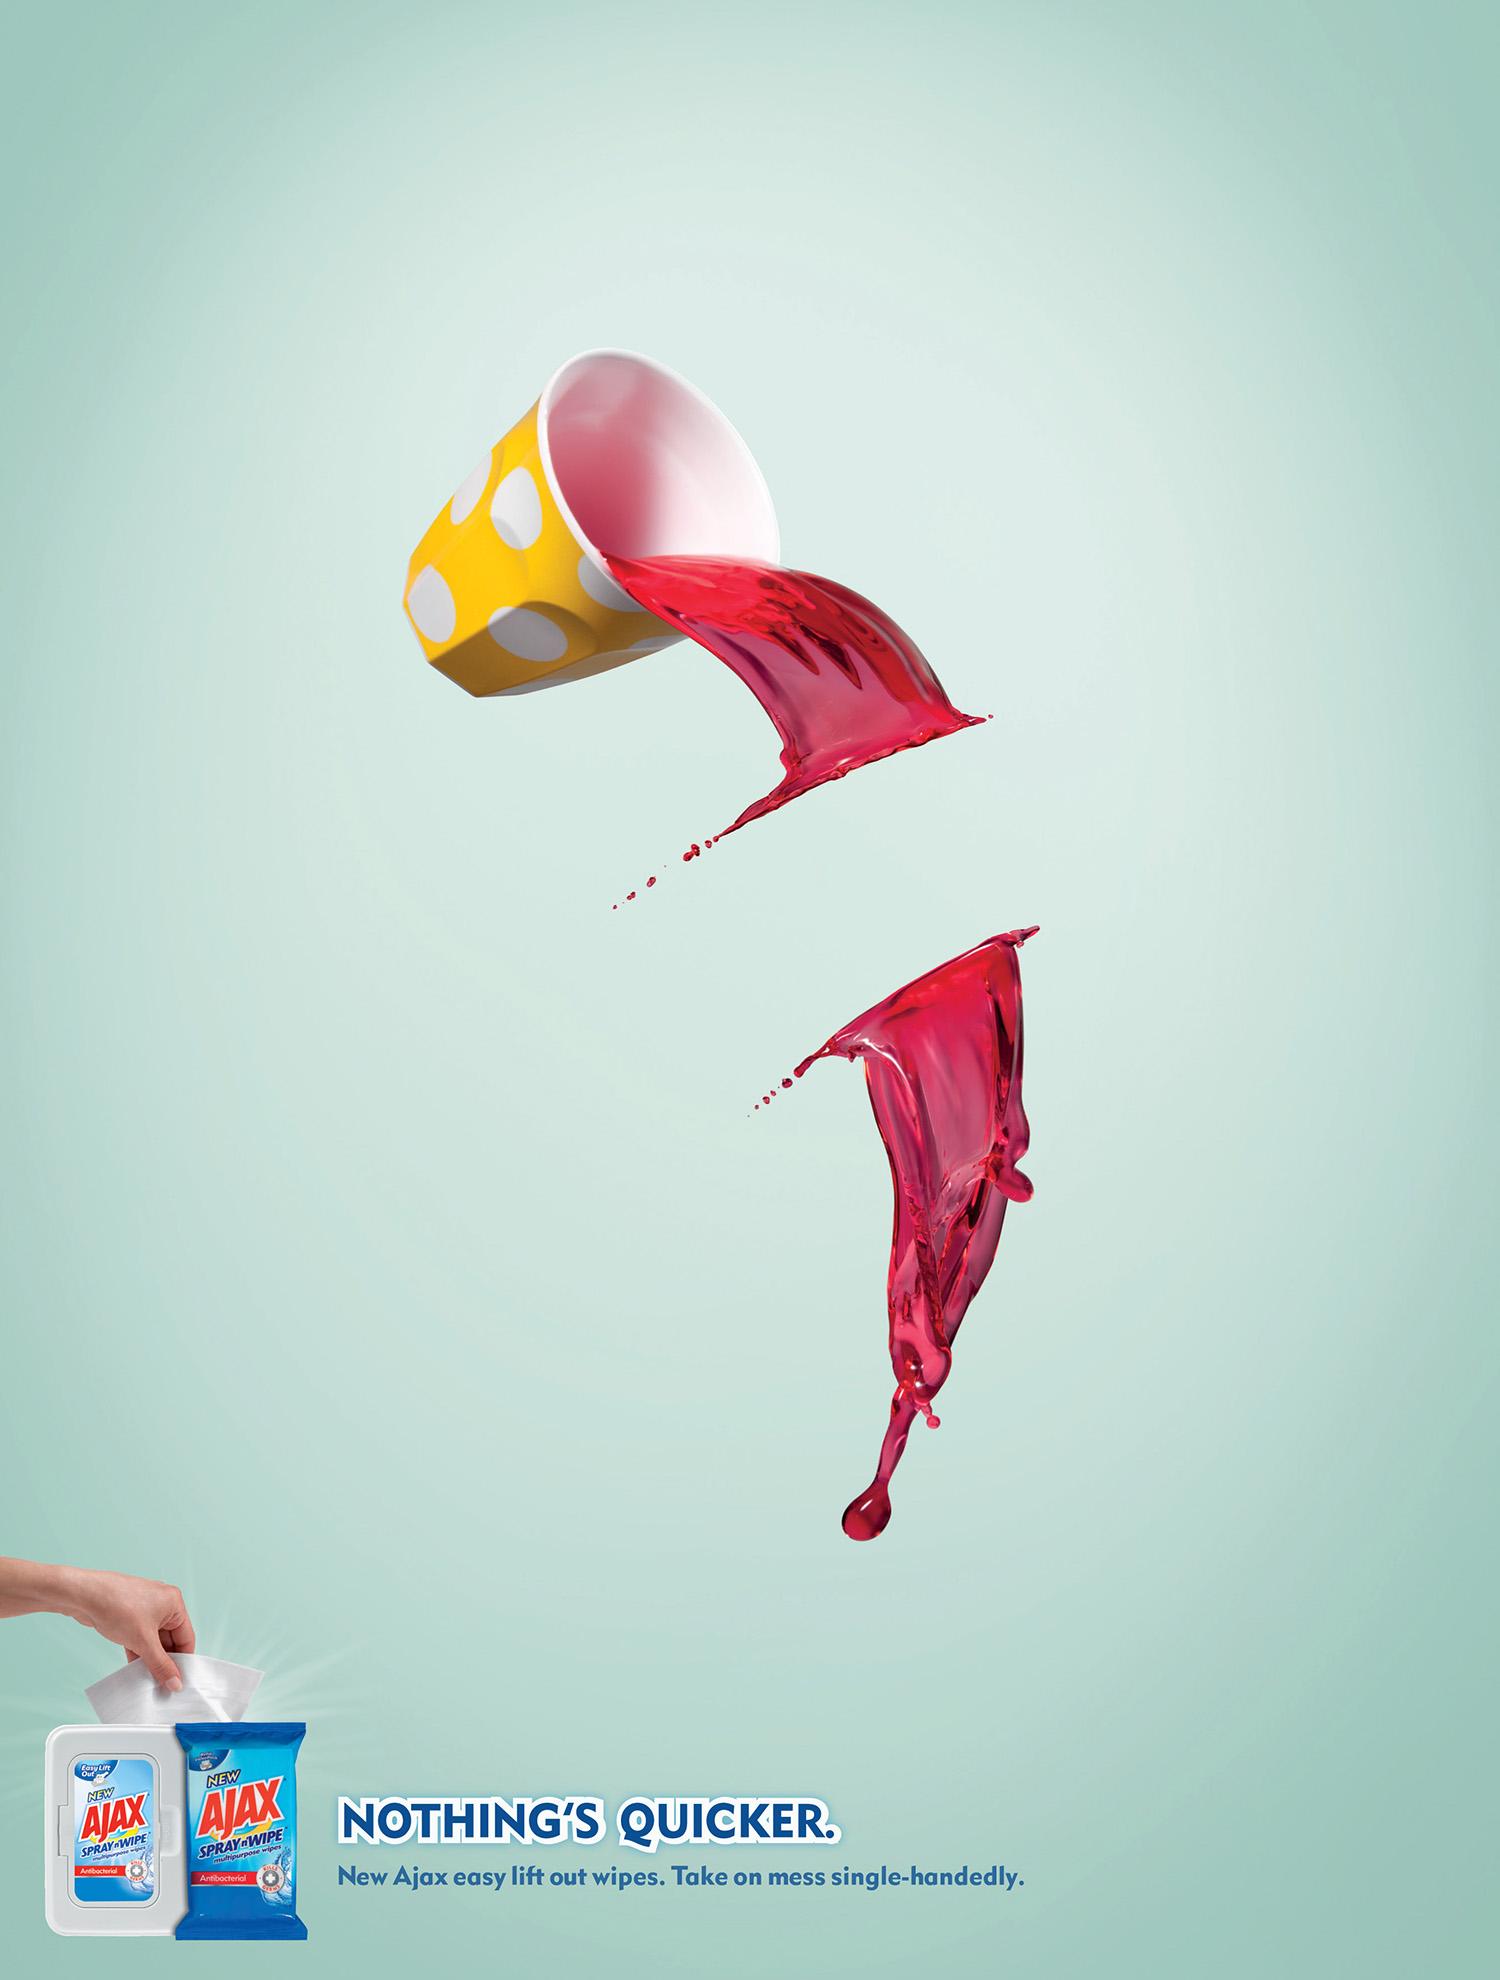 Ajax  Agency: Y&R New Zealand  Art Director: Tony Haigh  Retouching: Cream Studios